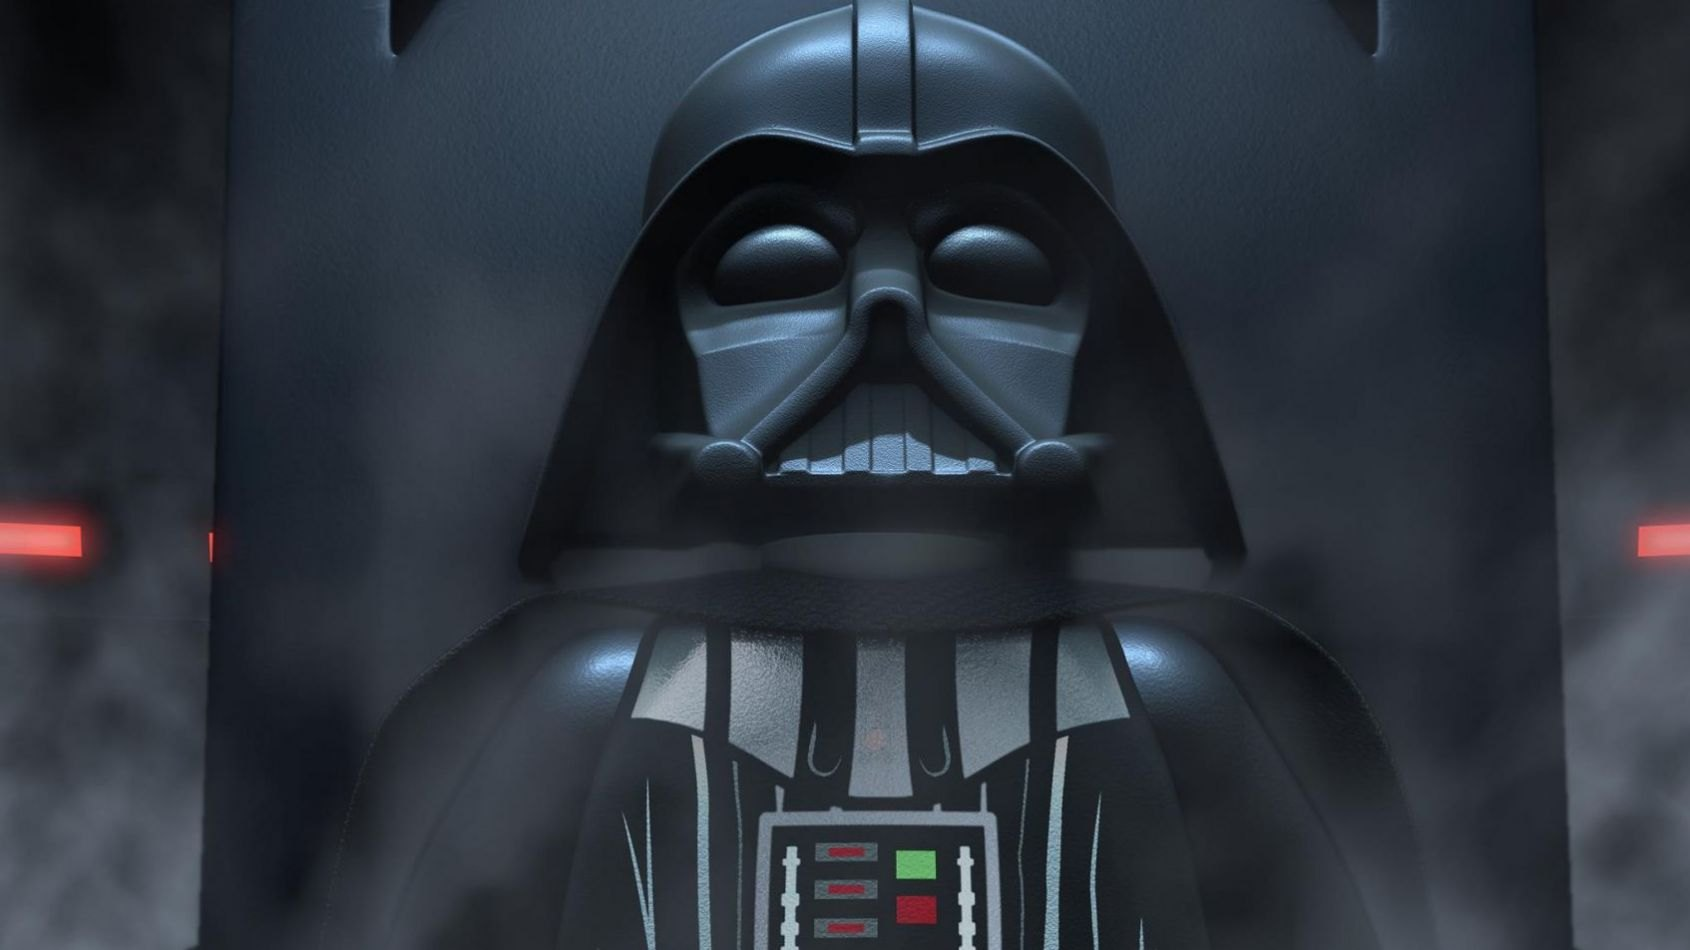 Nouveau set pour la naissance de dark vador en lego - Lego star wars avec dark vador ...